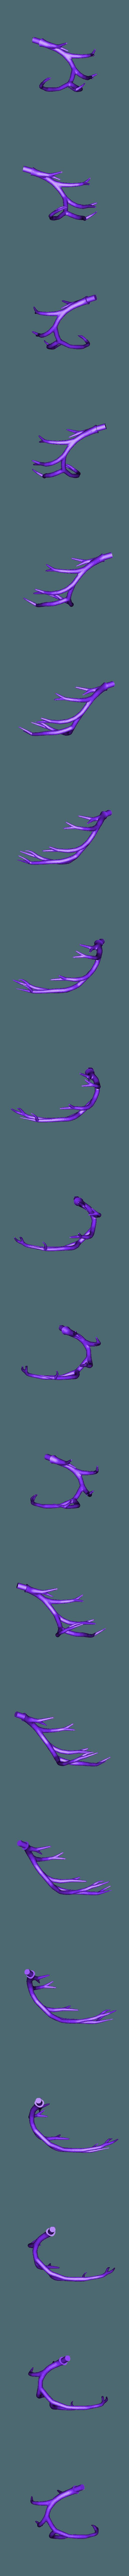 Deer-3.stl Télécharger fichier STL gratuit Reindeer with an antlers twist! • Objet imprimable en 3D, serial_print3r